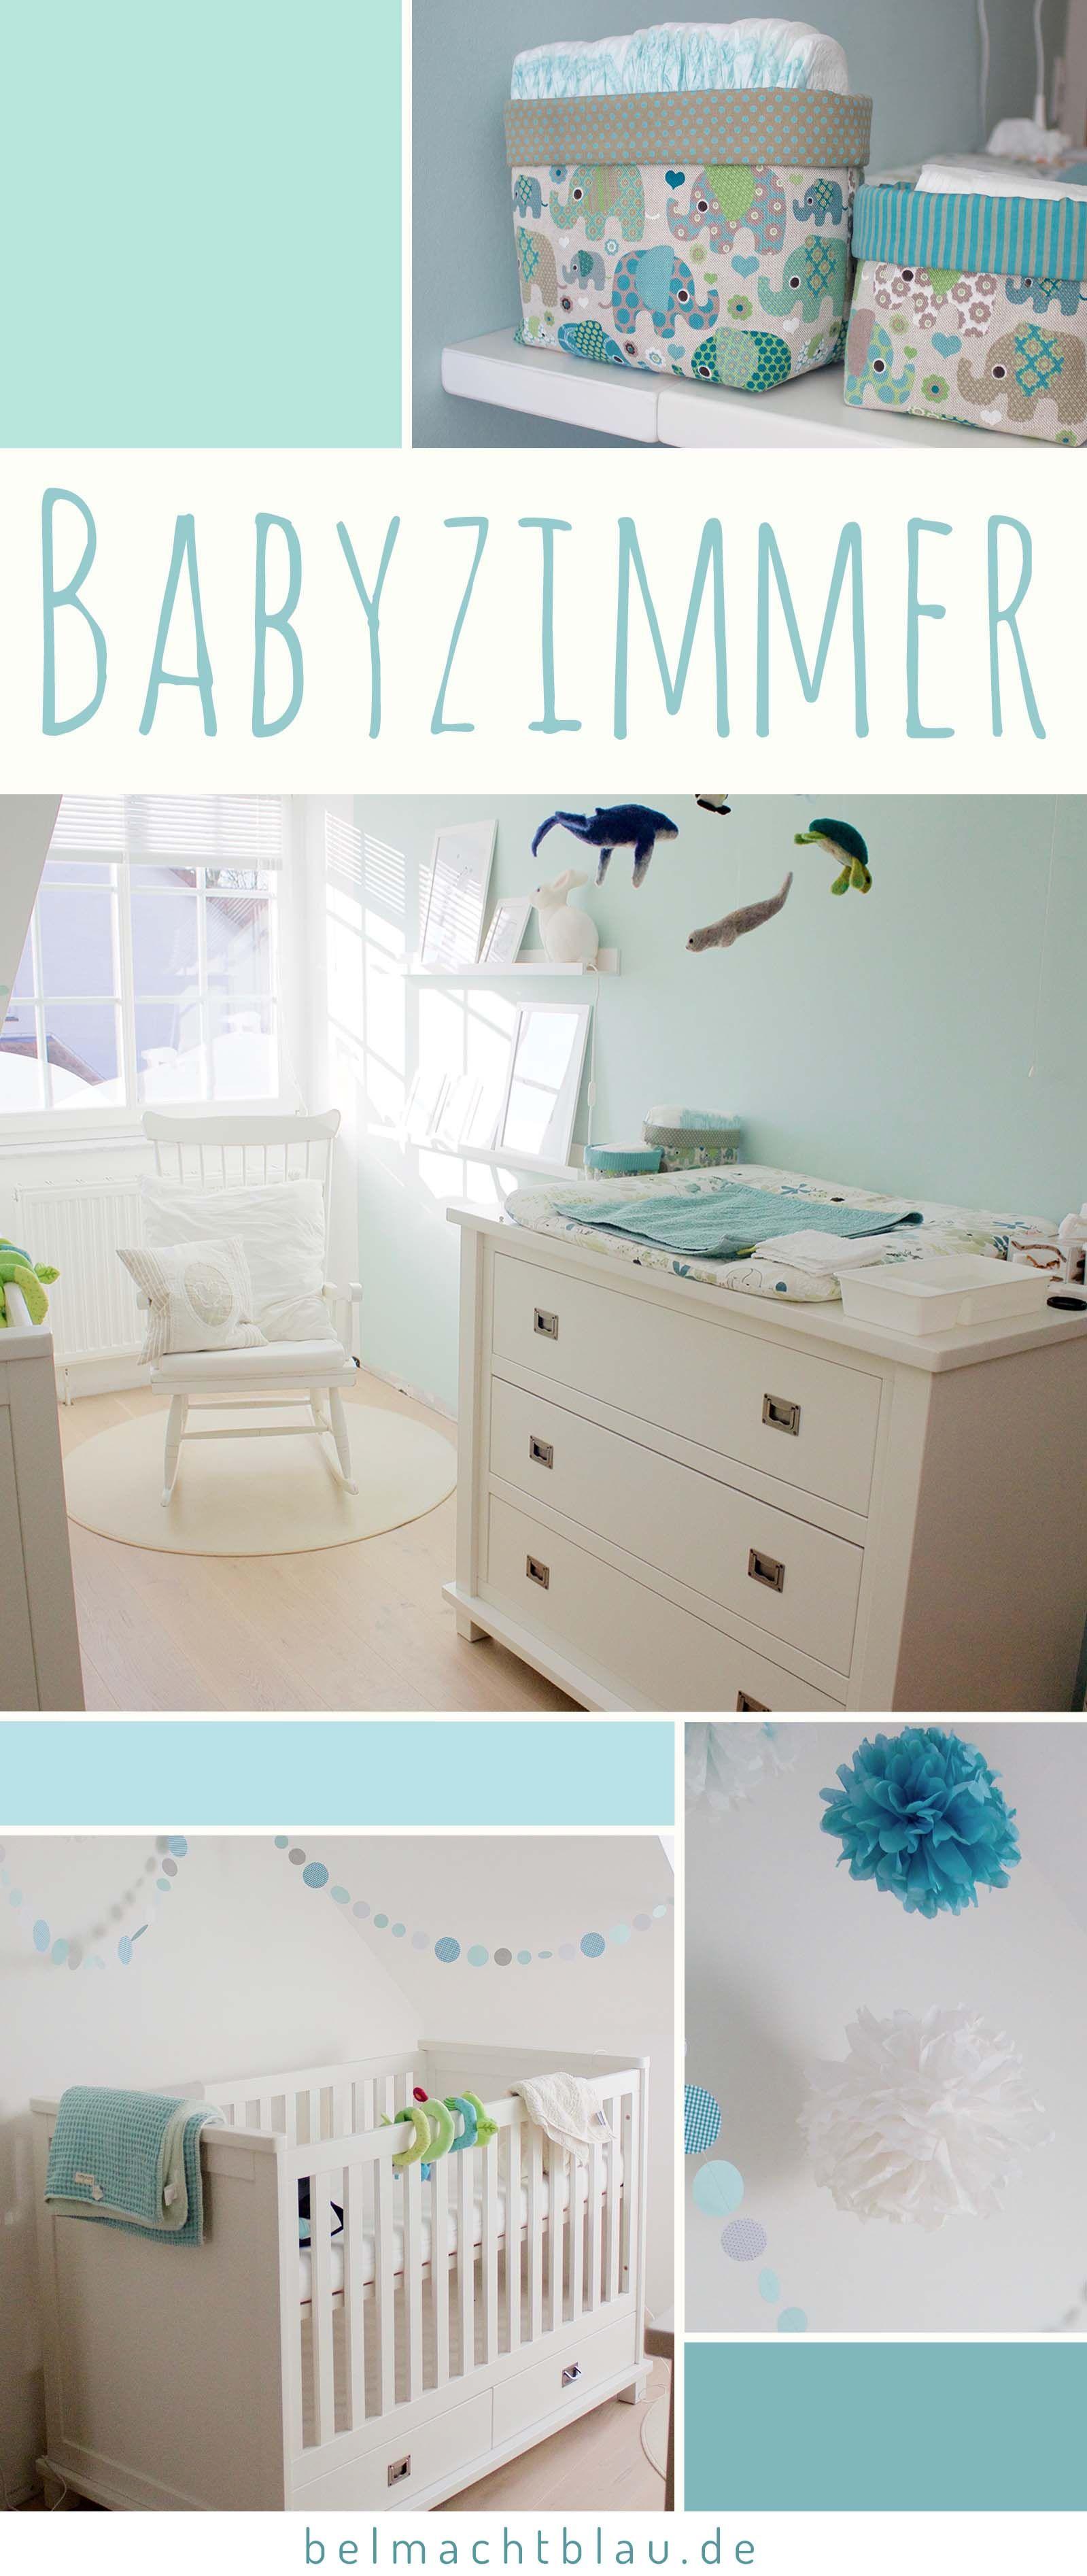 Einblicke ins Babyzimmer | Babyzimmer | Babyzimmer, Kinderzimmer ...